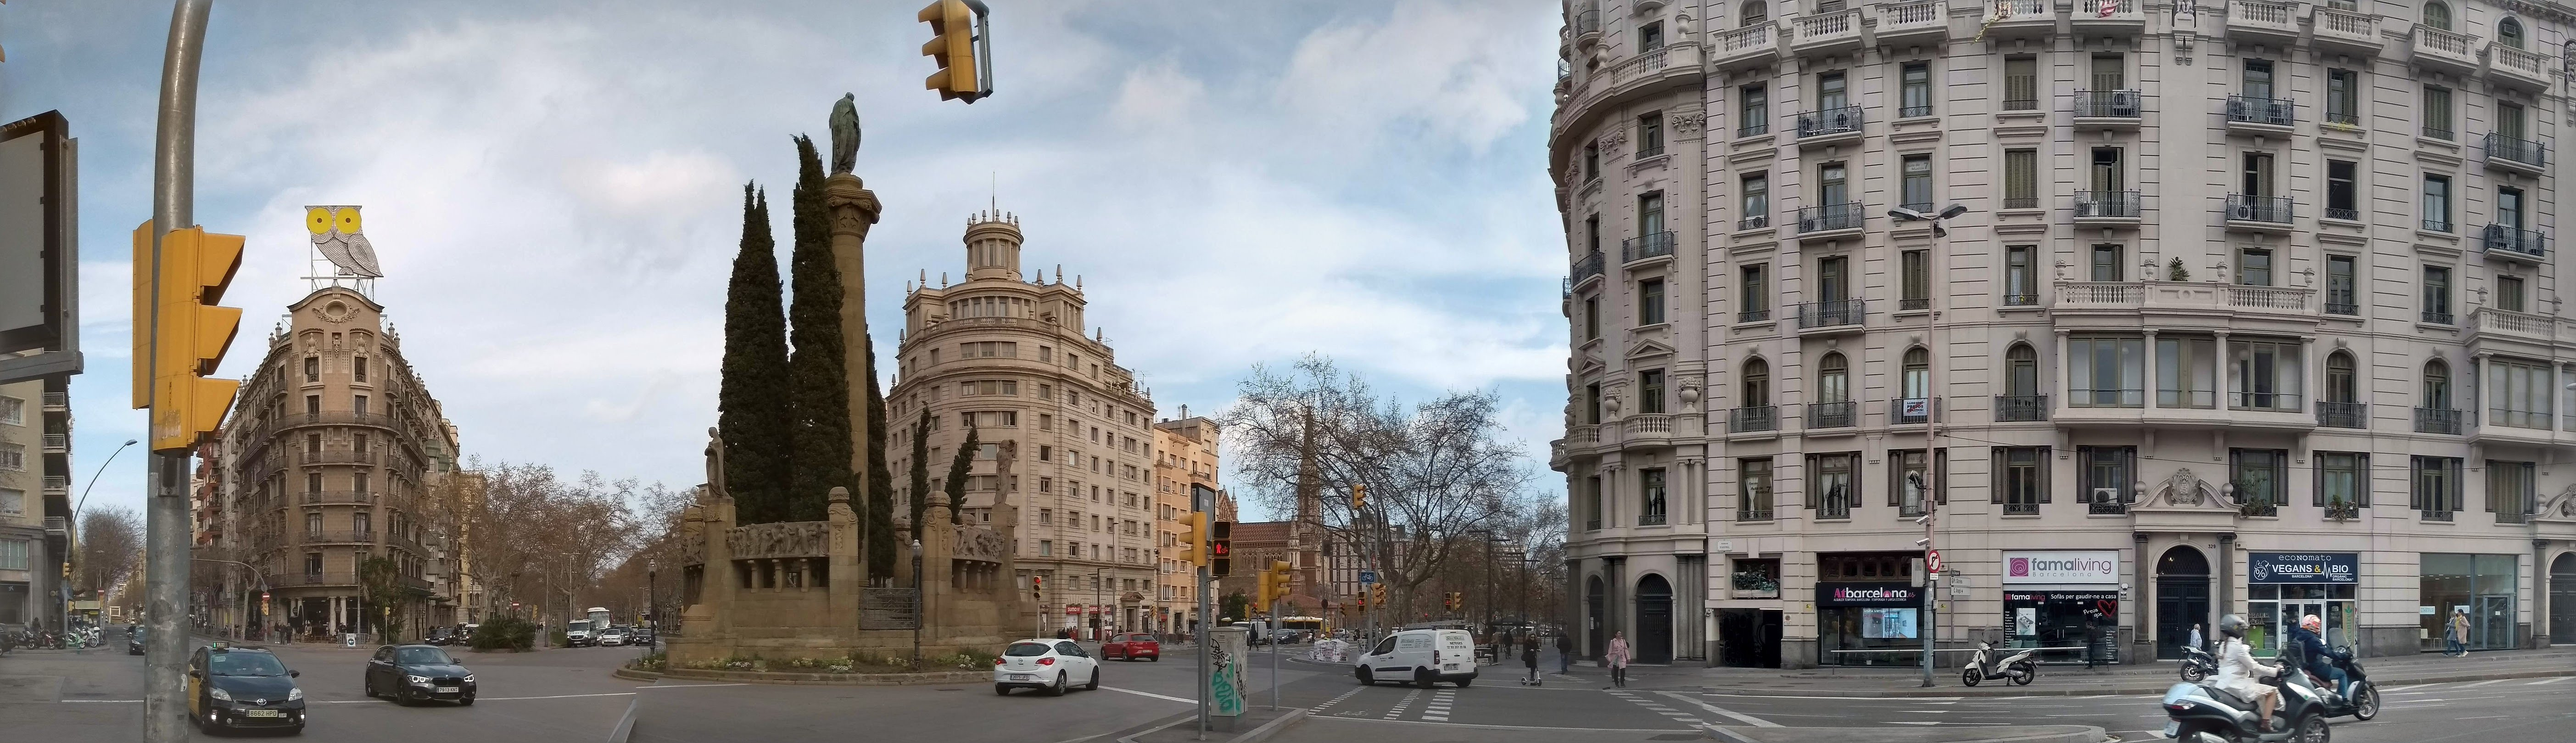 Erasmus_2019_Barcelona_43